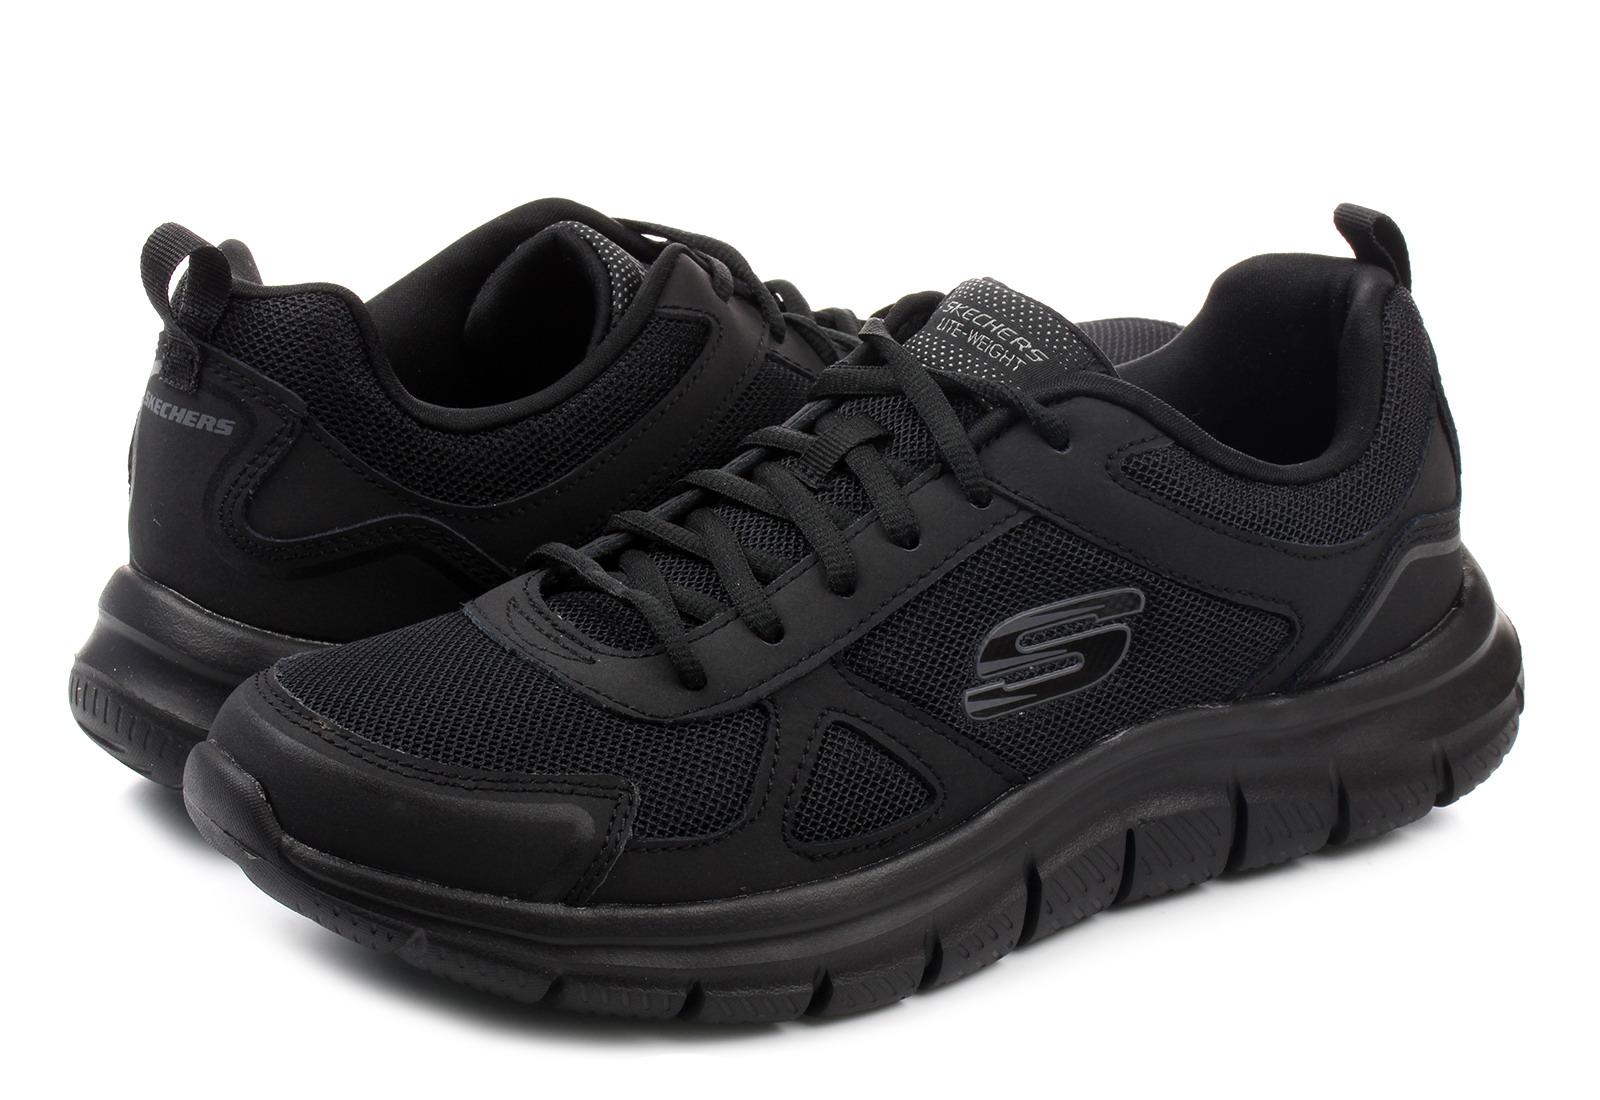 Skechers Equalizer Férfi cipő, Szürke, 44